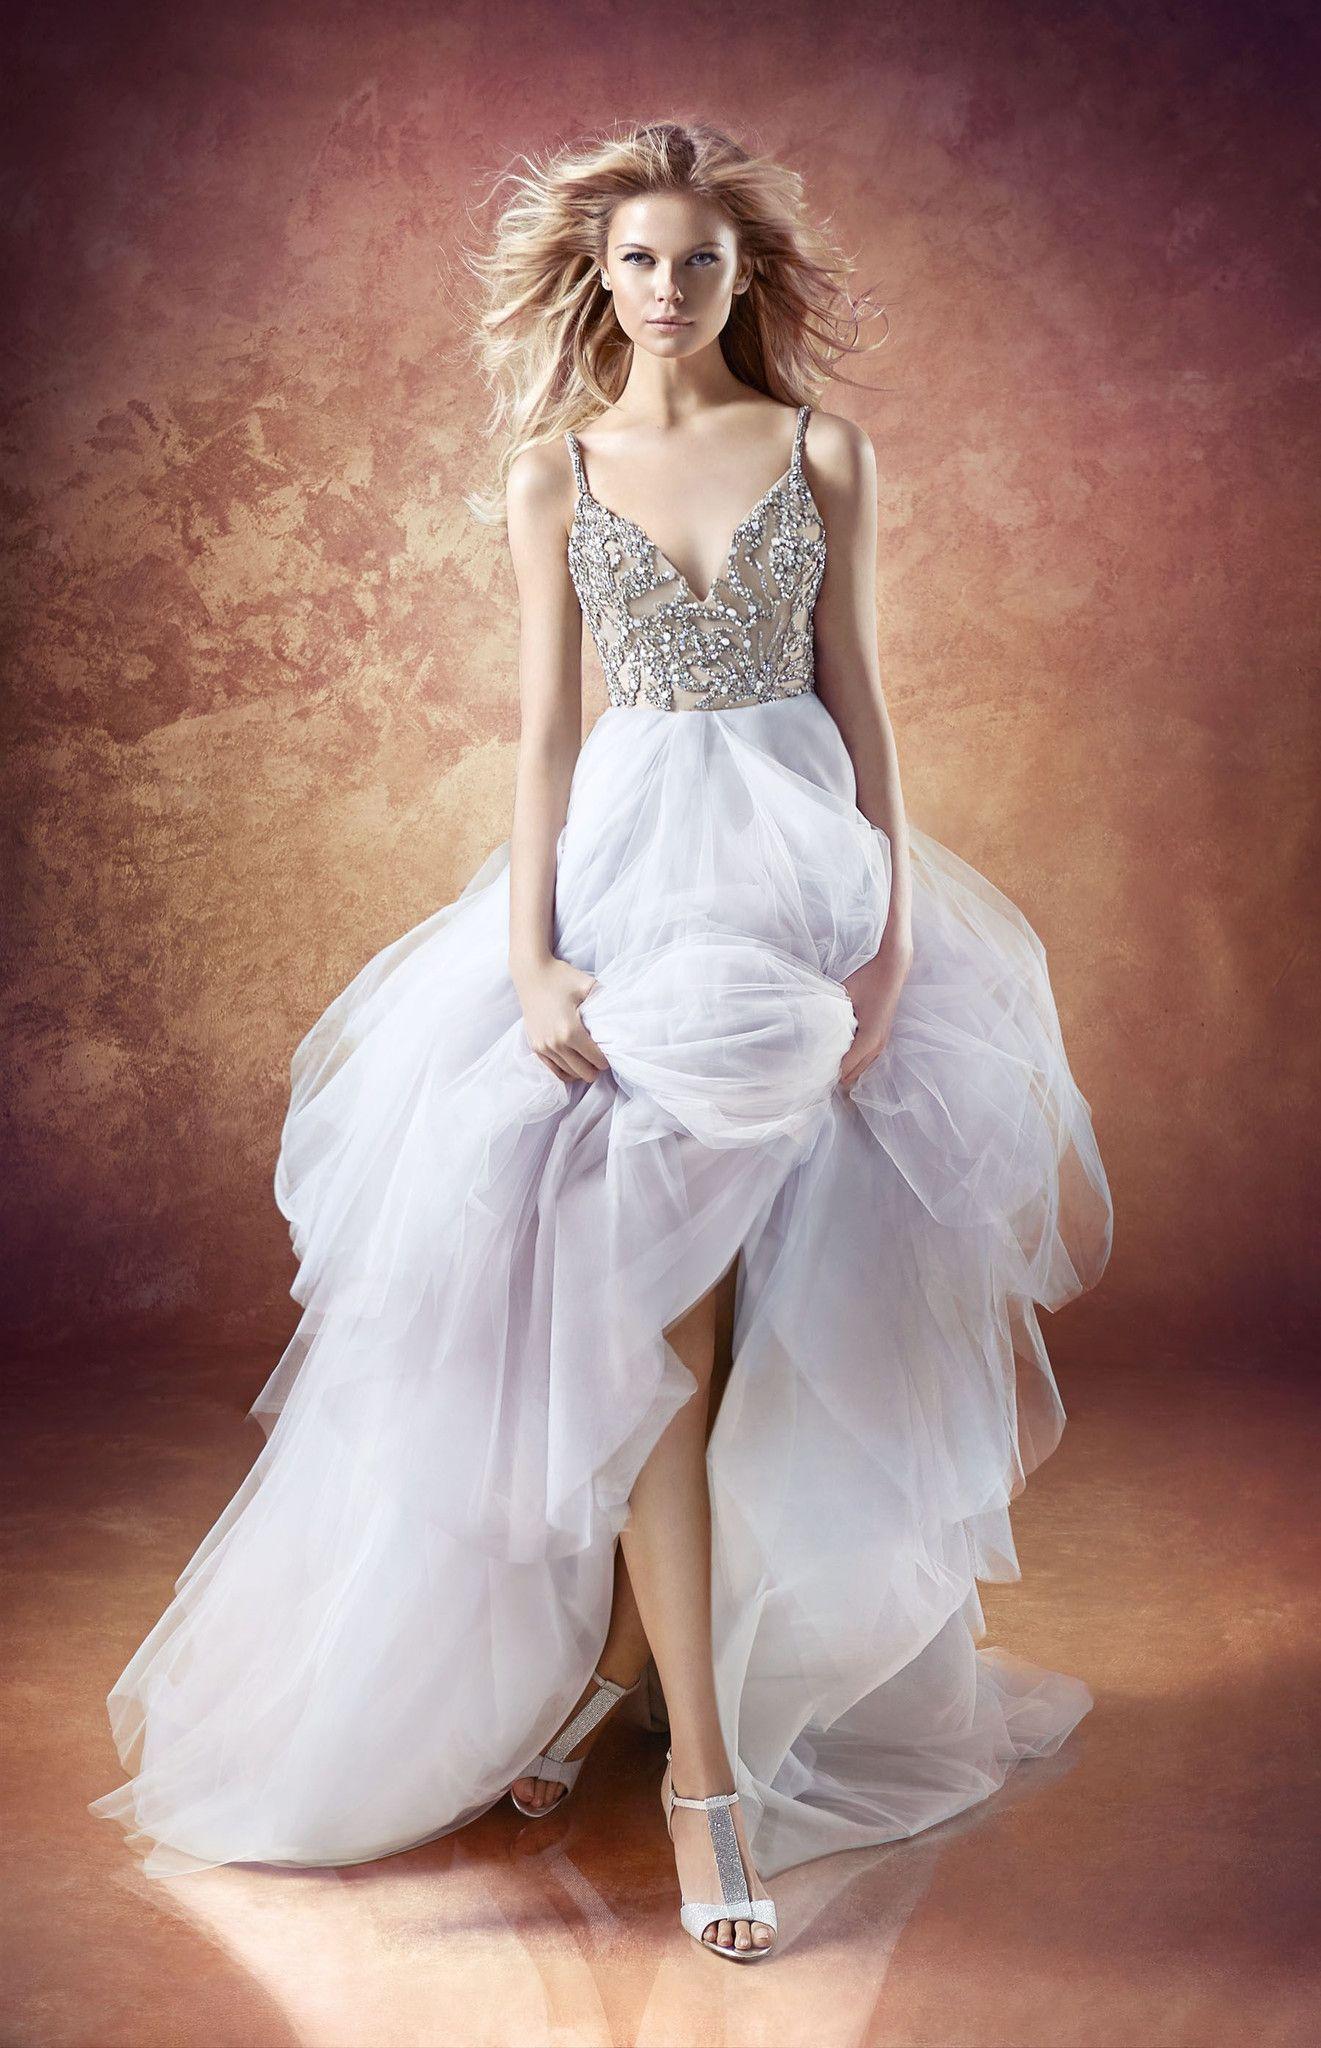 Hologram Wedding Dress